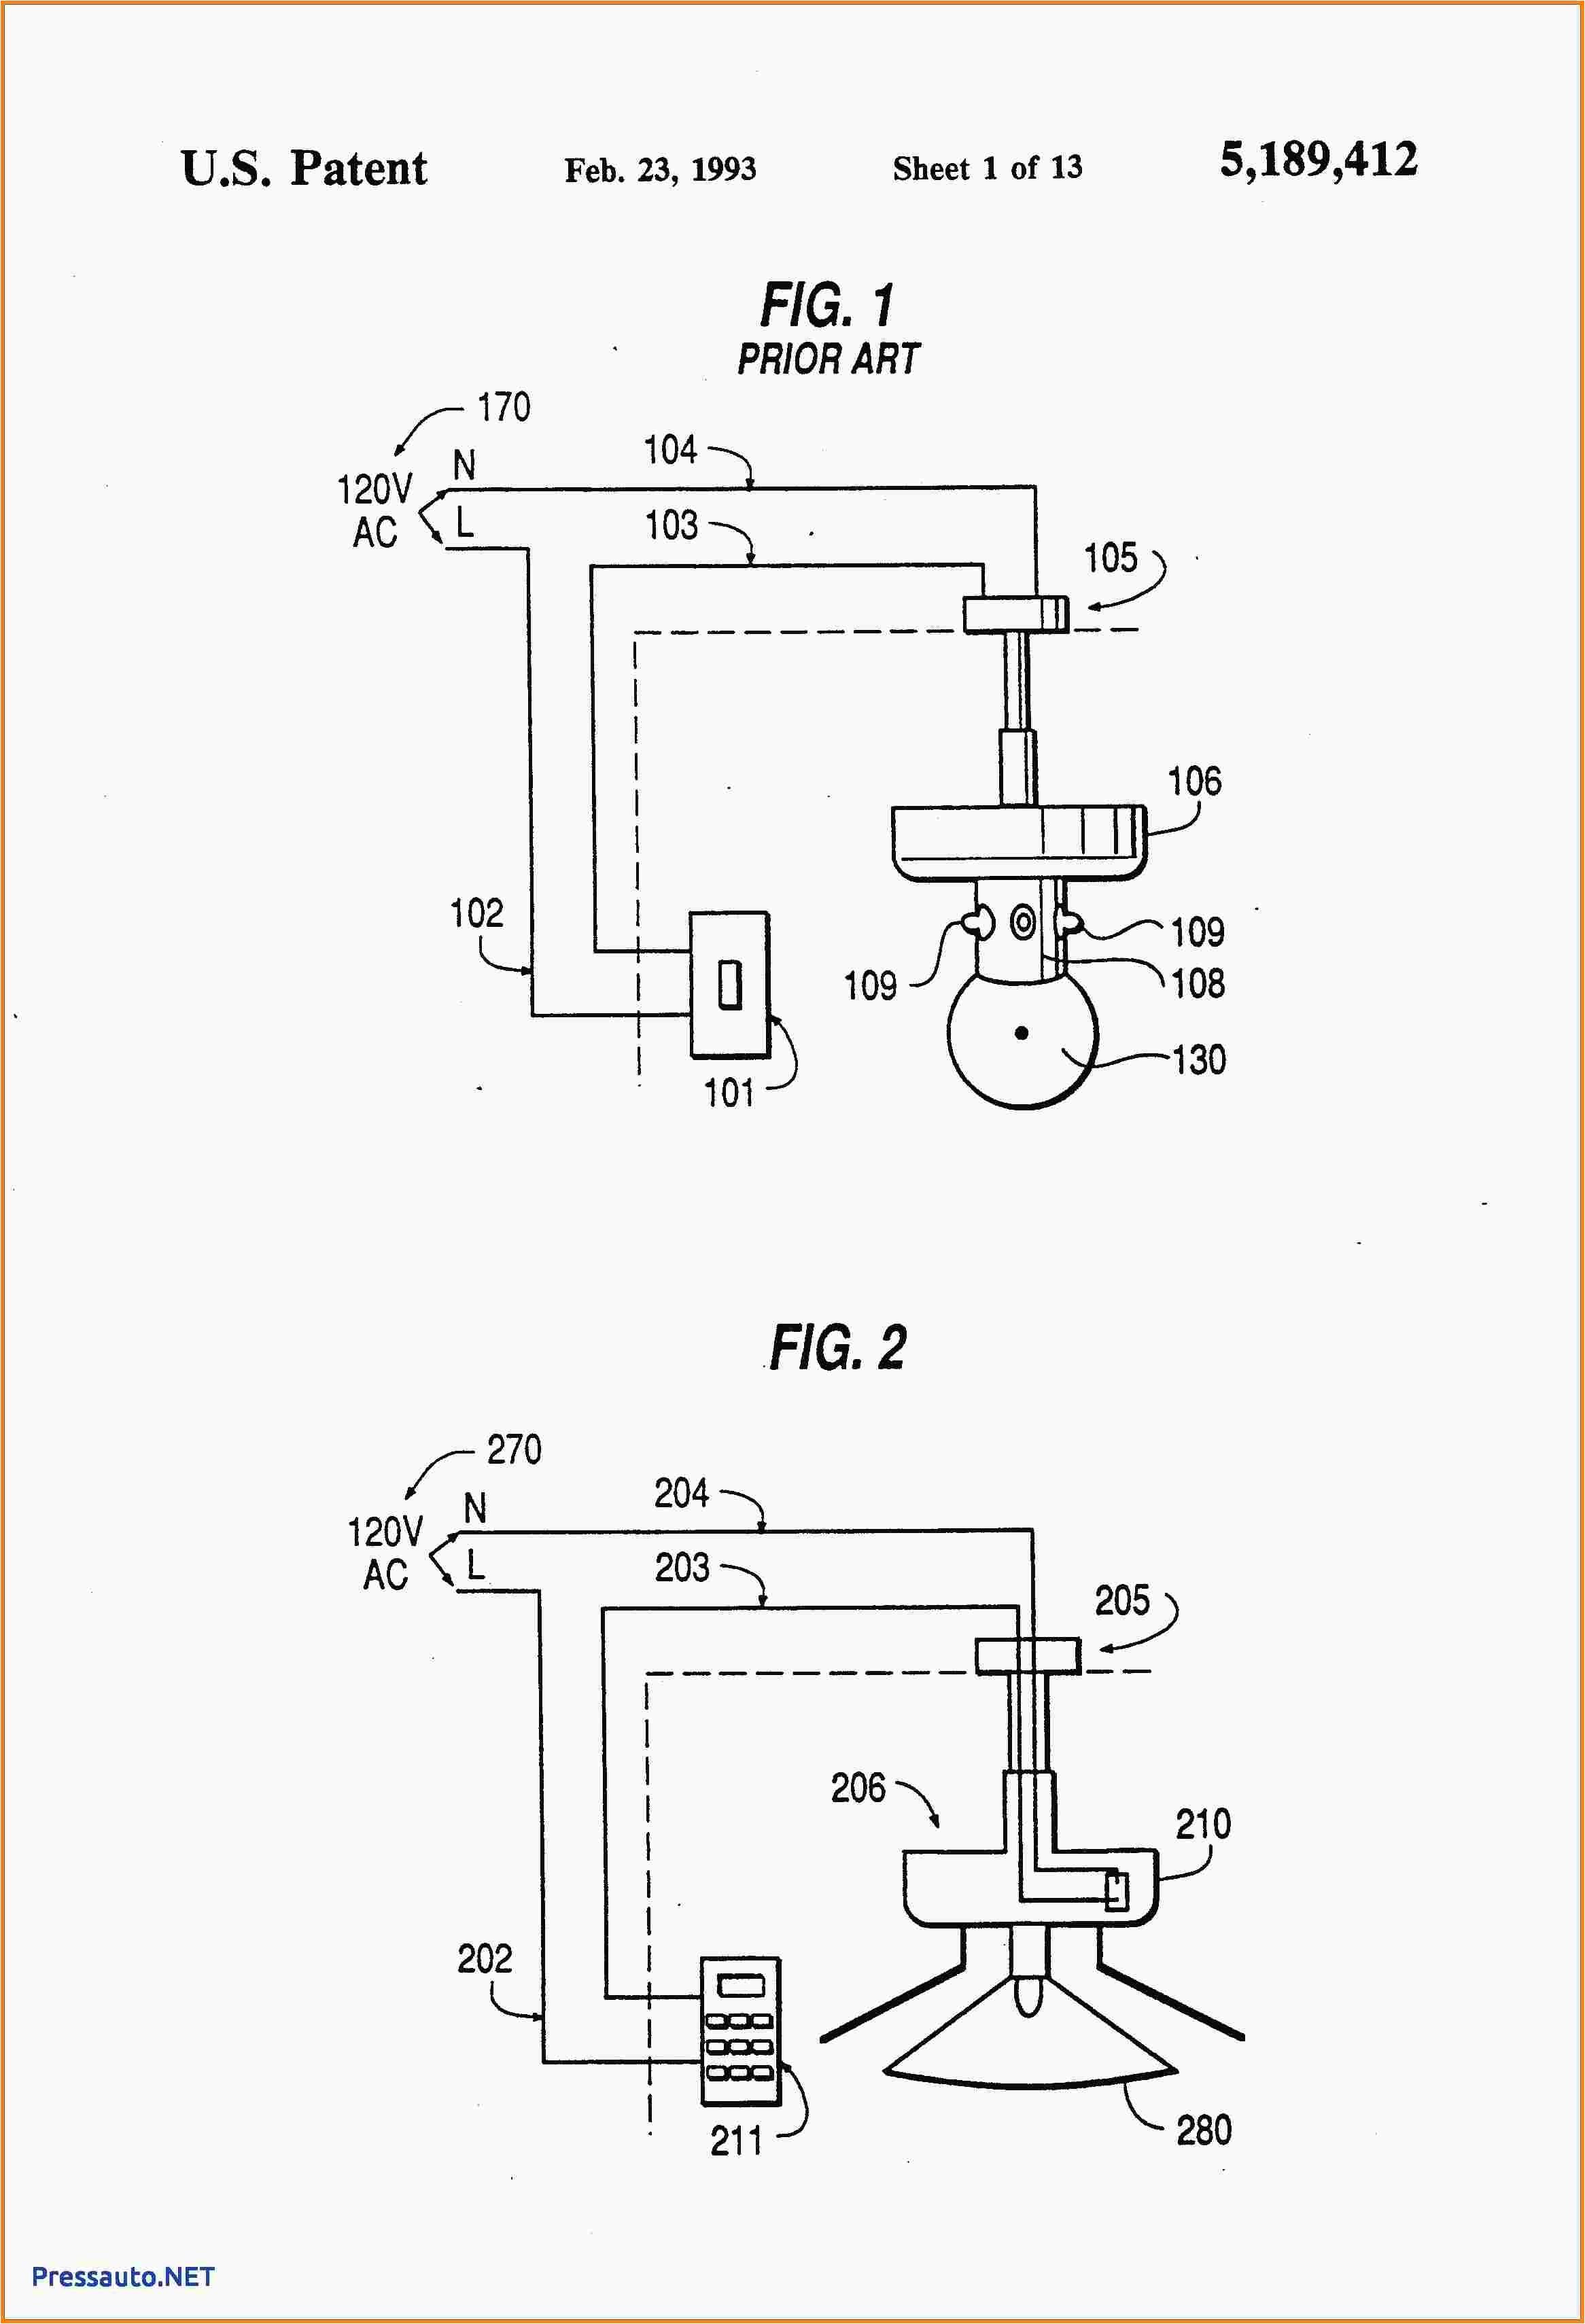 d7908 wiring diagram wiring diagram for youd7908 wiring diagram wiring diagram dat d7908 wiring diagram